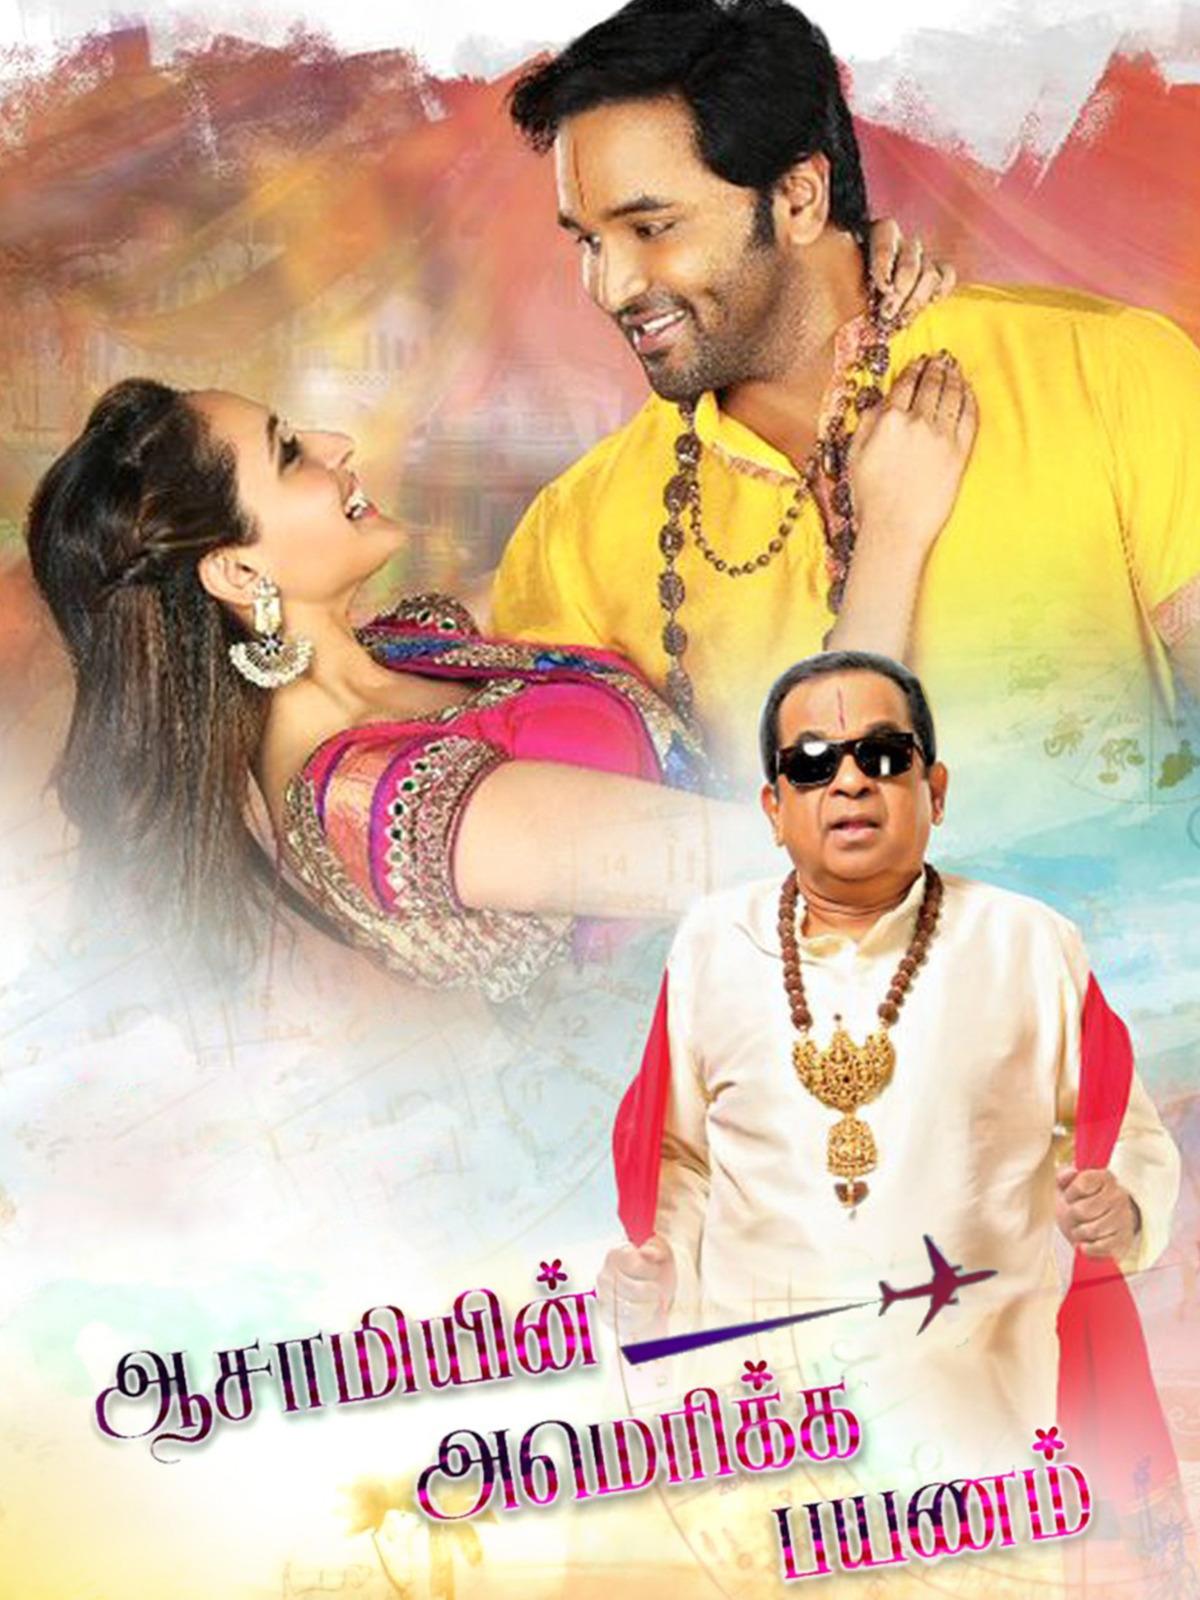 Aasaamiyin America Payanam (2021) Tamil Dubbed HDRip | GDrive